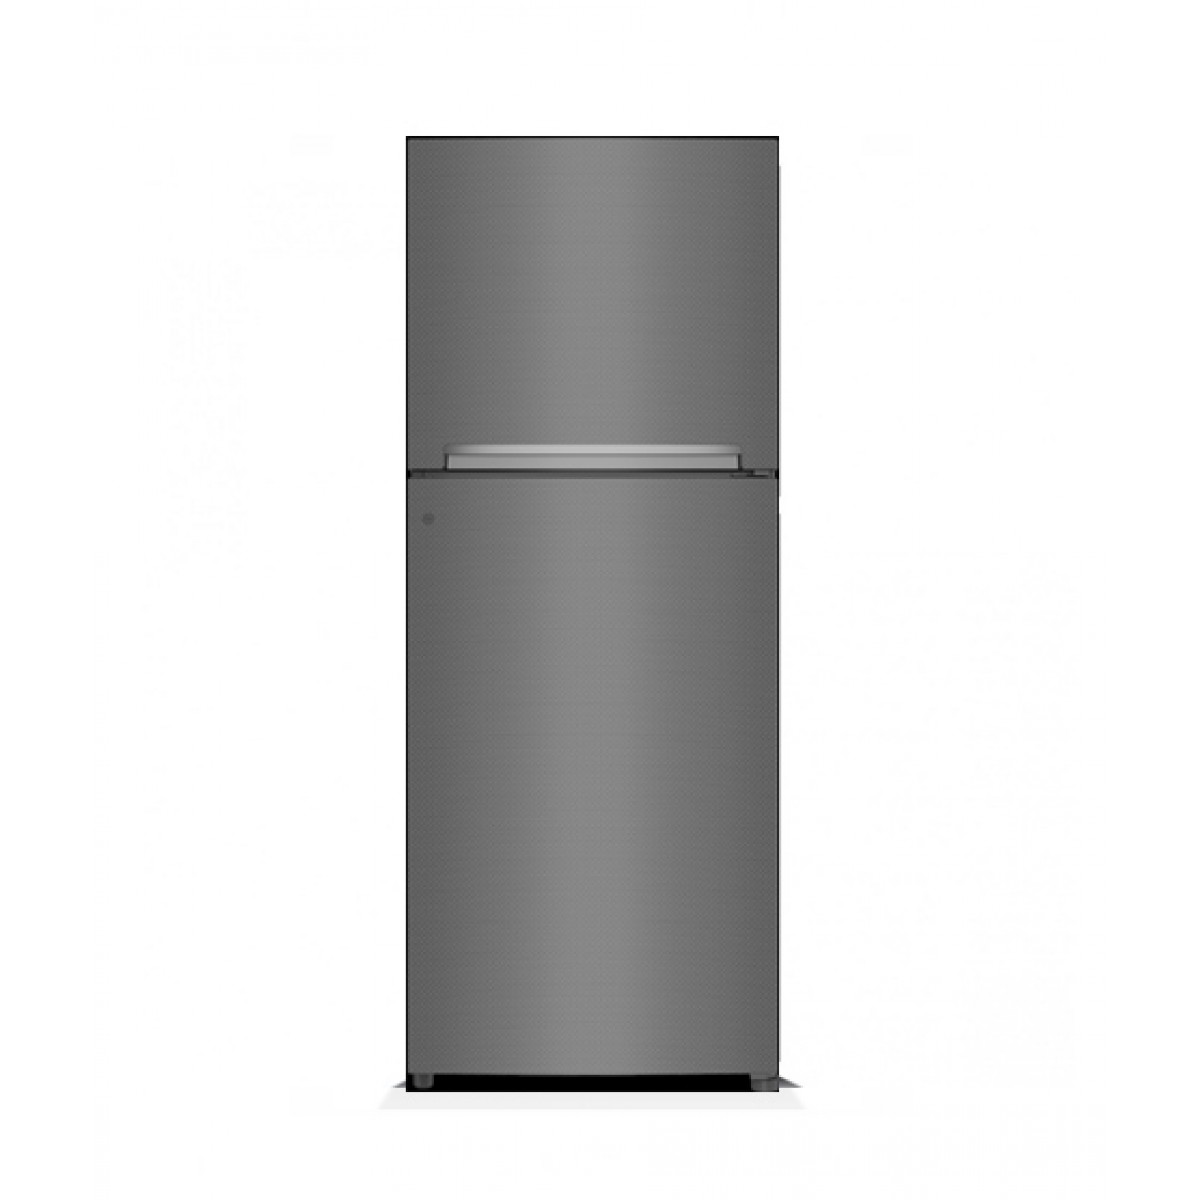 Dawlance Euro Design Freezer-on-Top Refrigerator 12 Cu Ft (9175 WB)